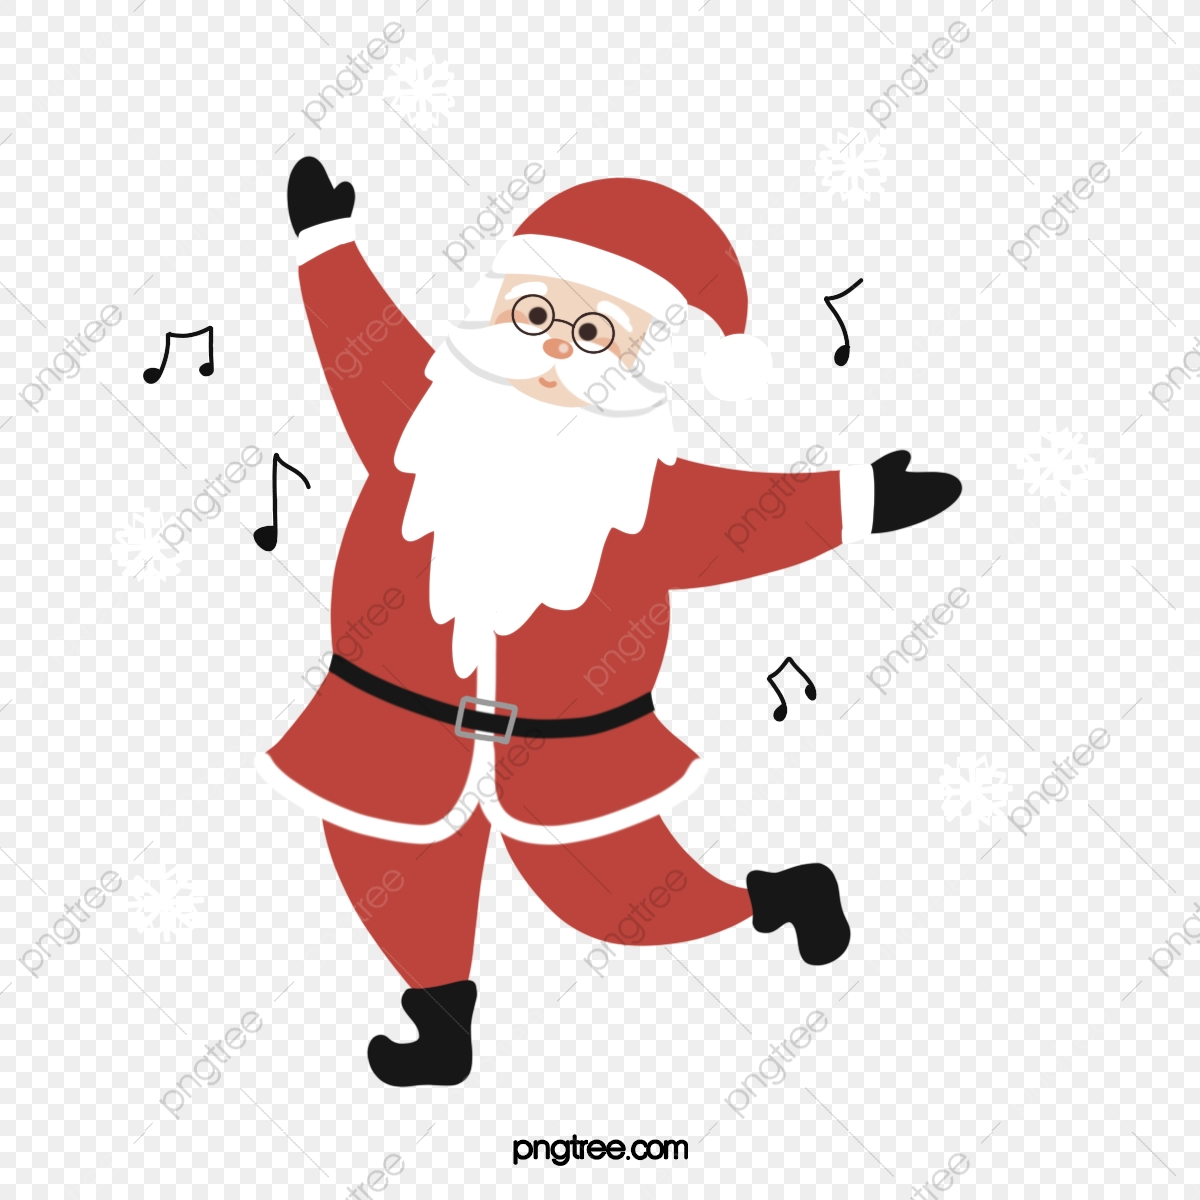 Simple Cute Dancing Santa Element Santa Claus Christmas Dance Png Transparent Clipart Image And Psd File For Free Download